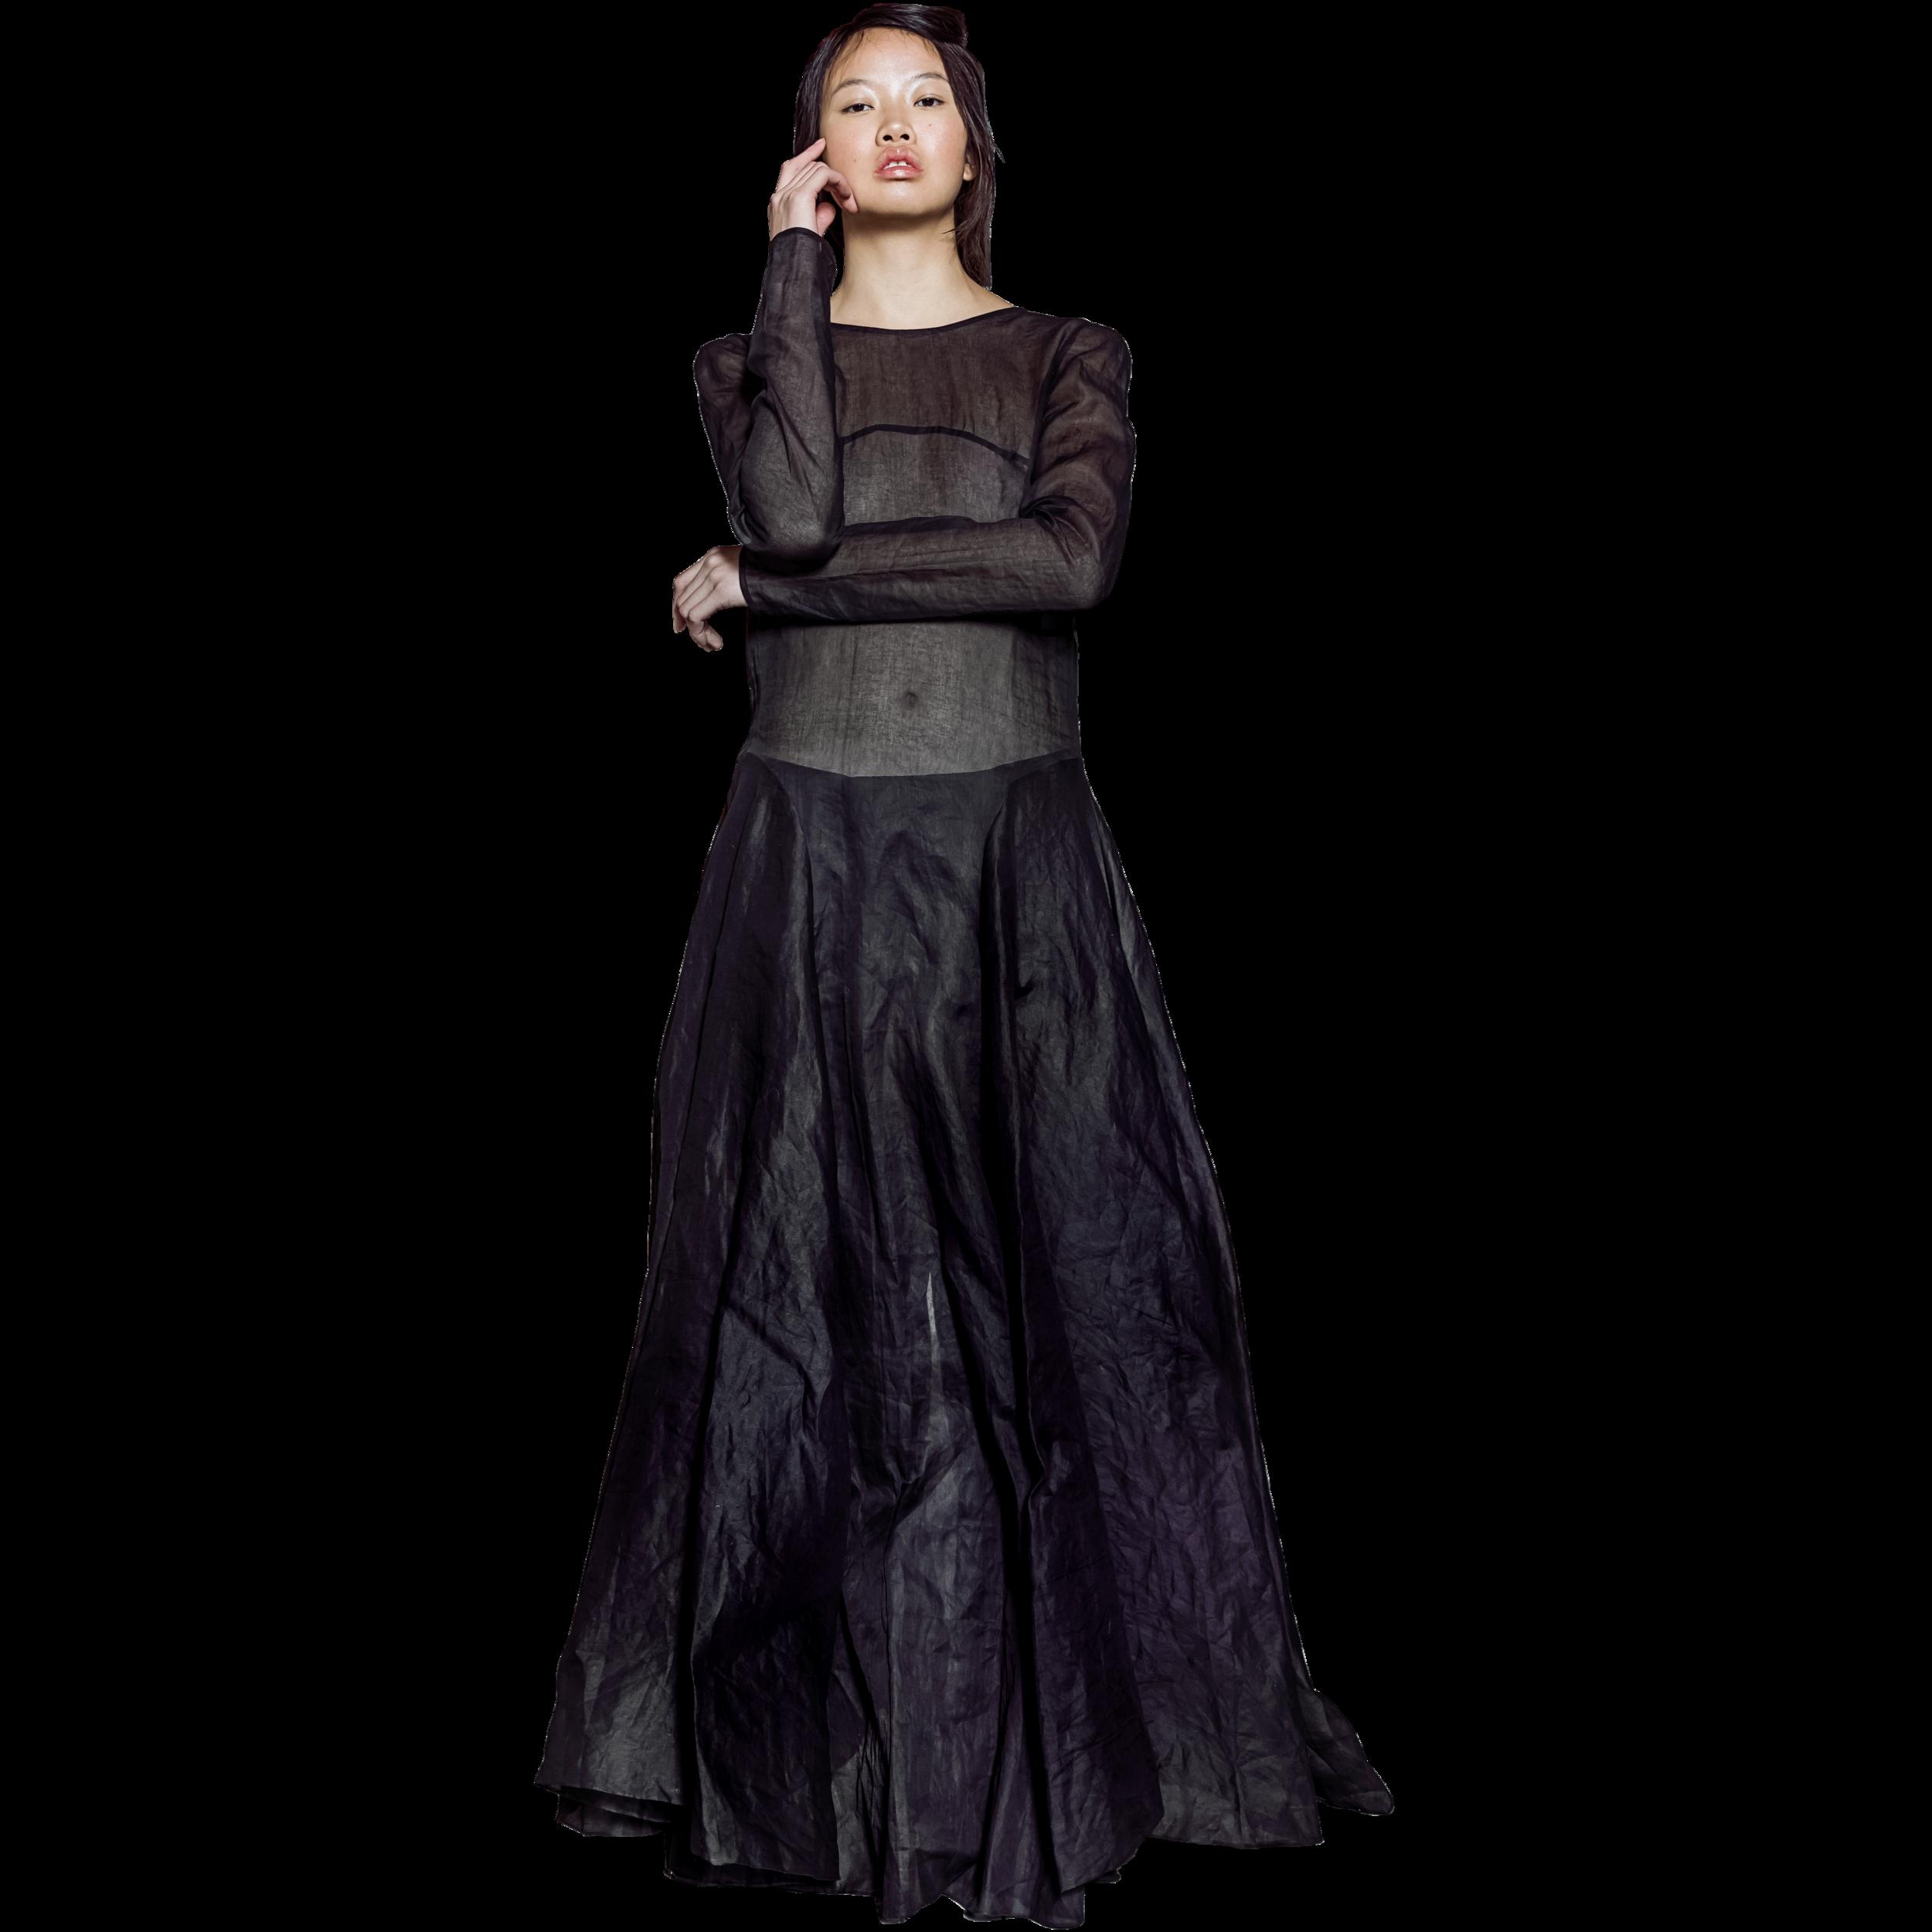 a15e940522 Black Long Sleeve Dress With Full Skirt - Gomes Weine AG